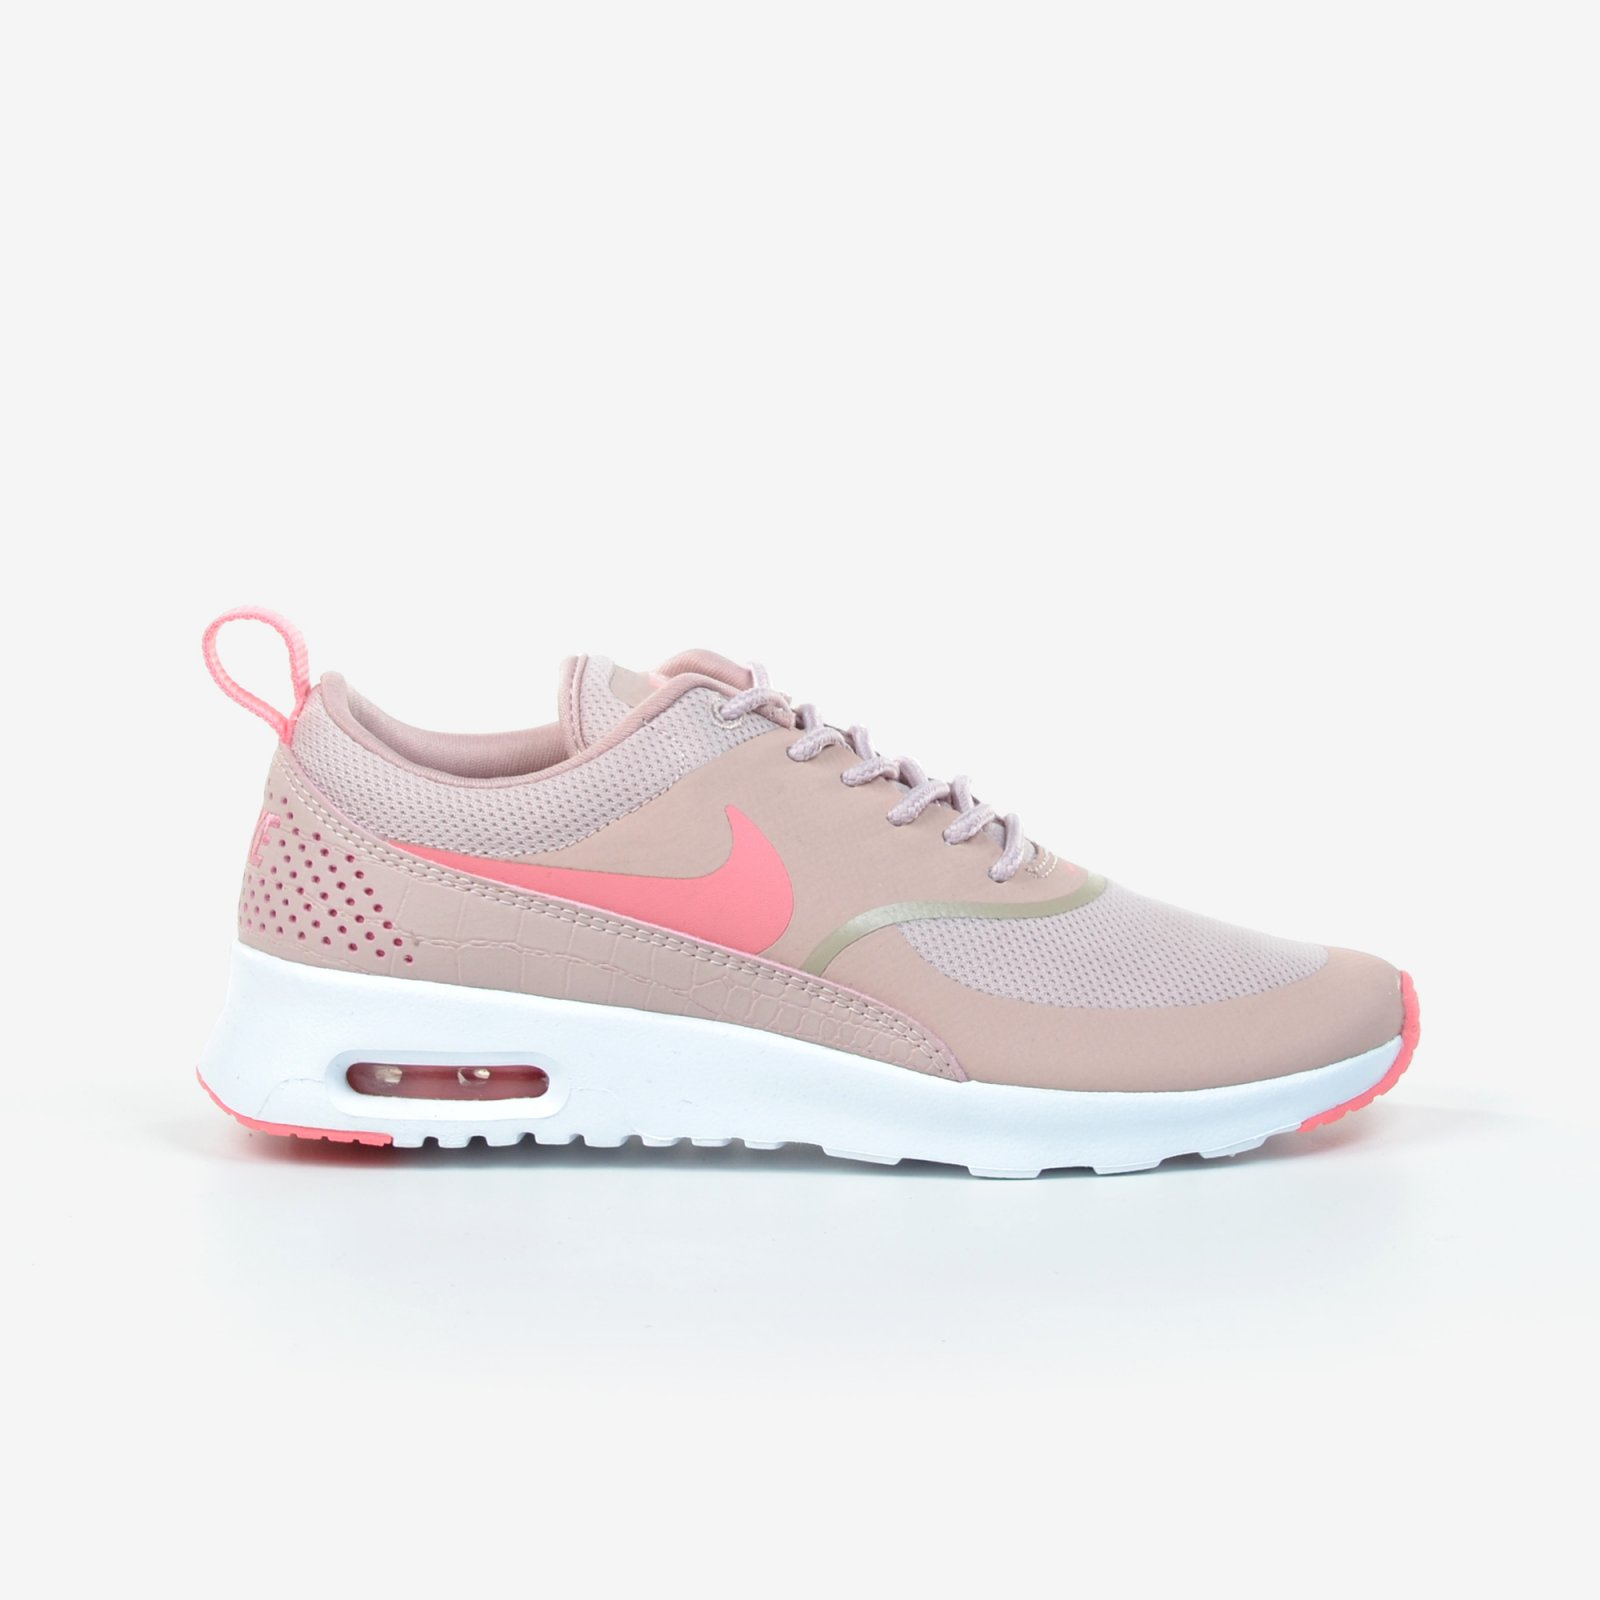 NIKE WMNS AIR Max Thea Sneakers Damen Schuhe Pink NEU EUR